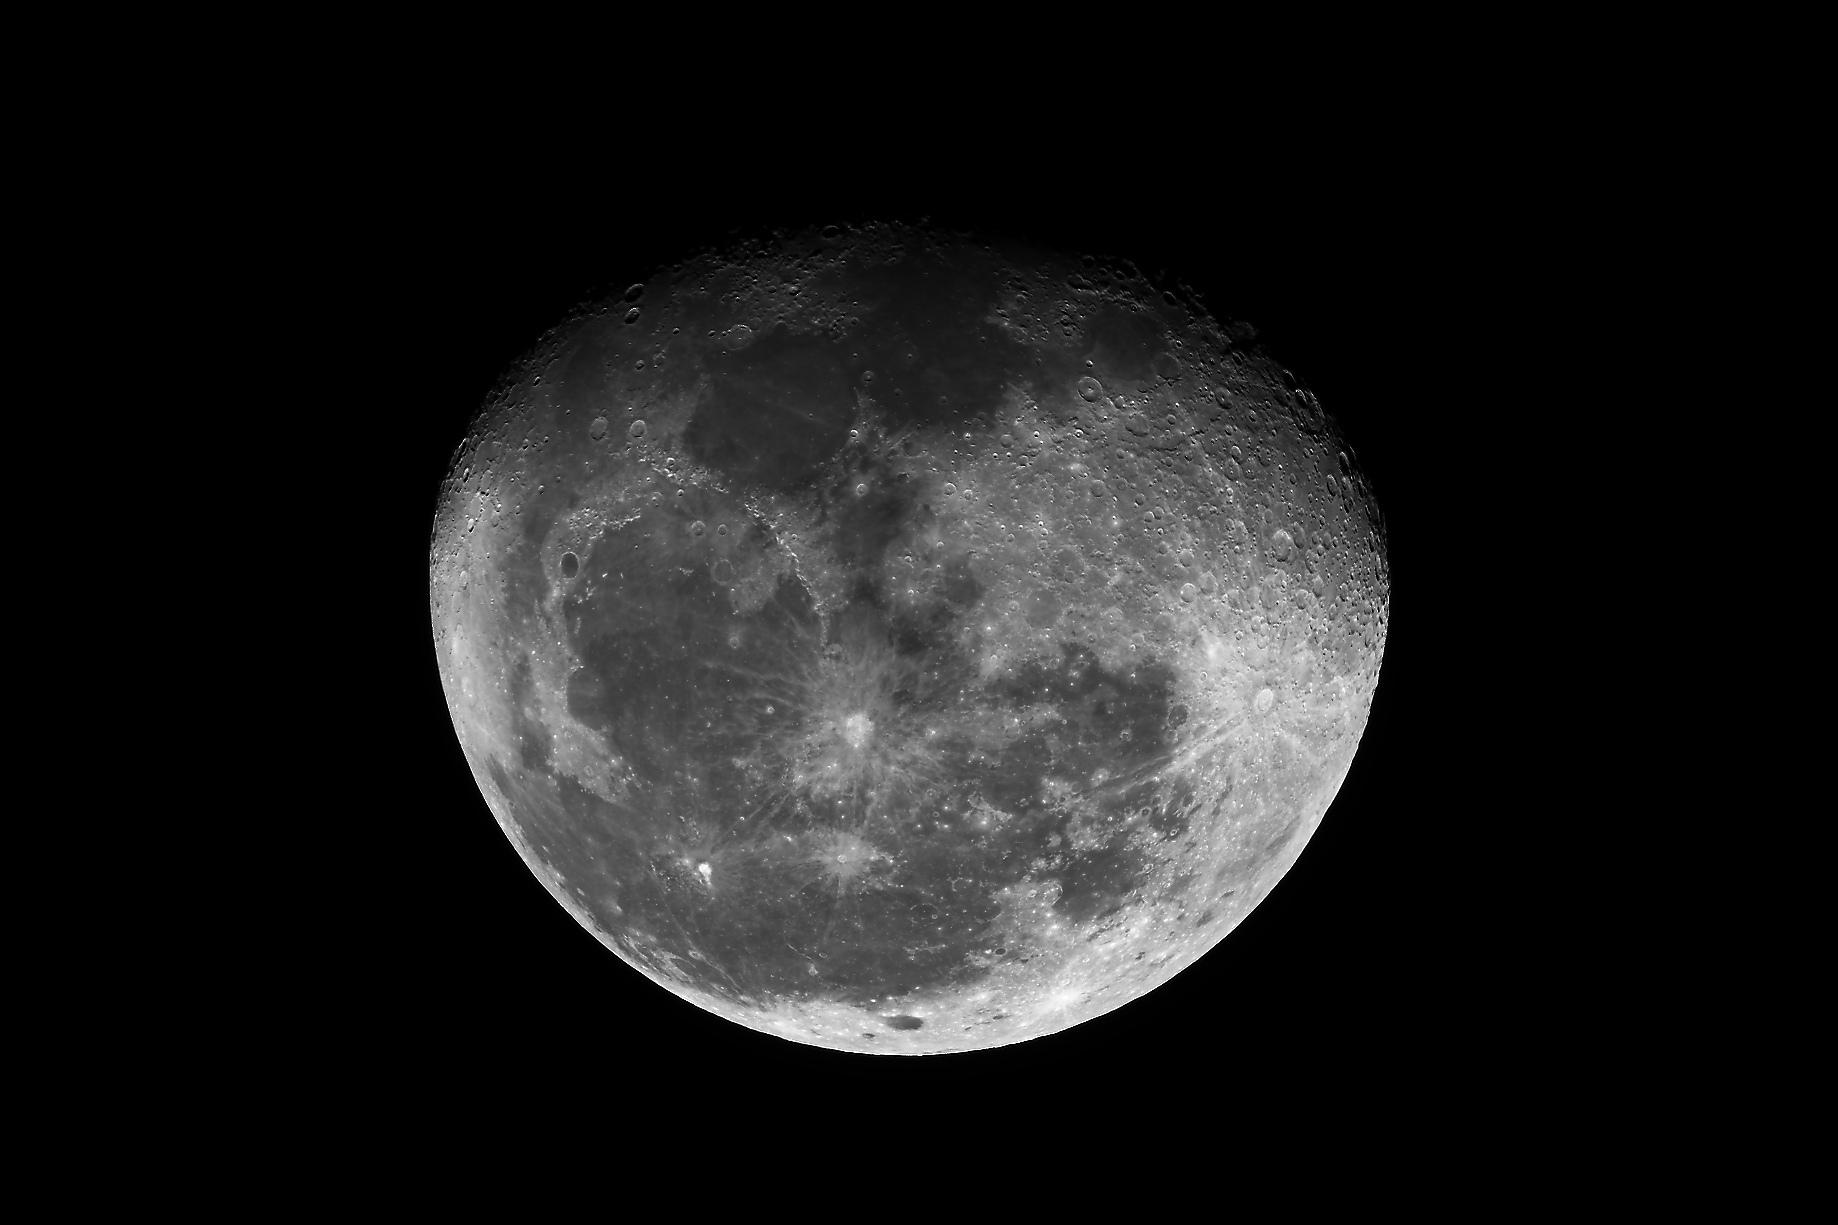 171009 - Lune gibbeuse - Pollux - STL11K